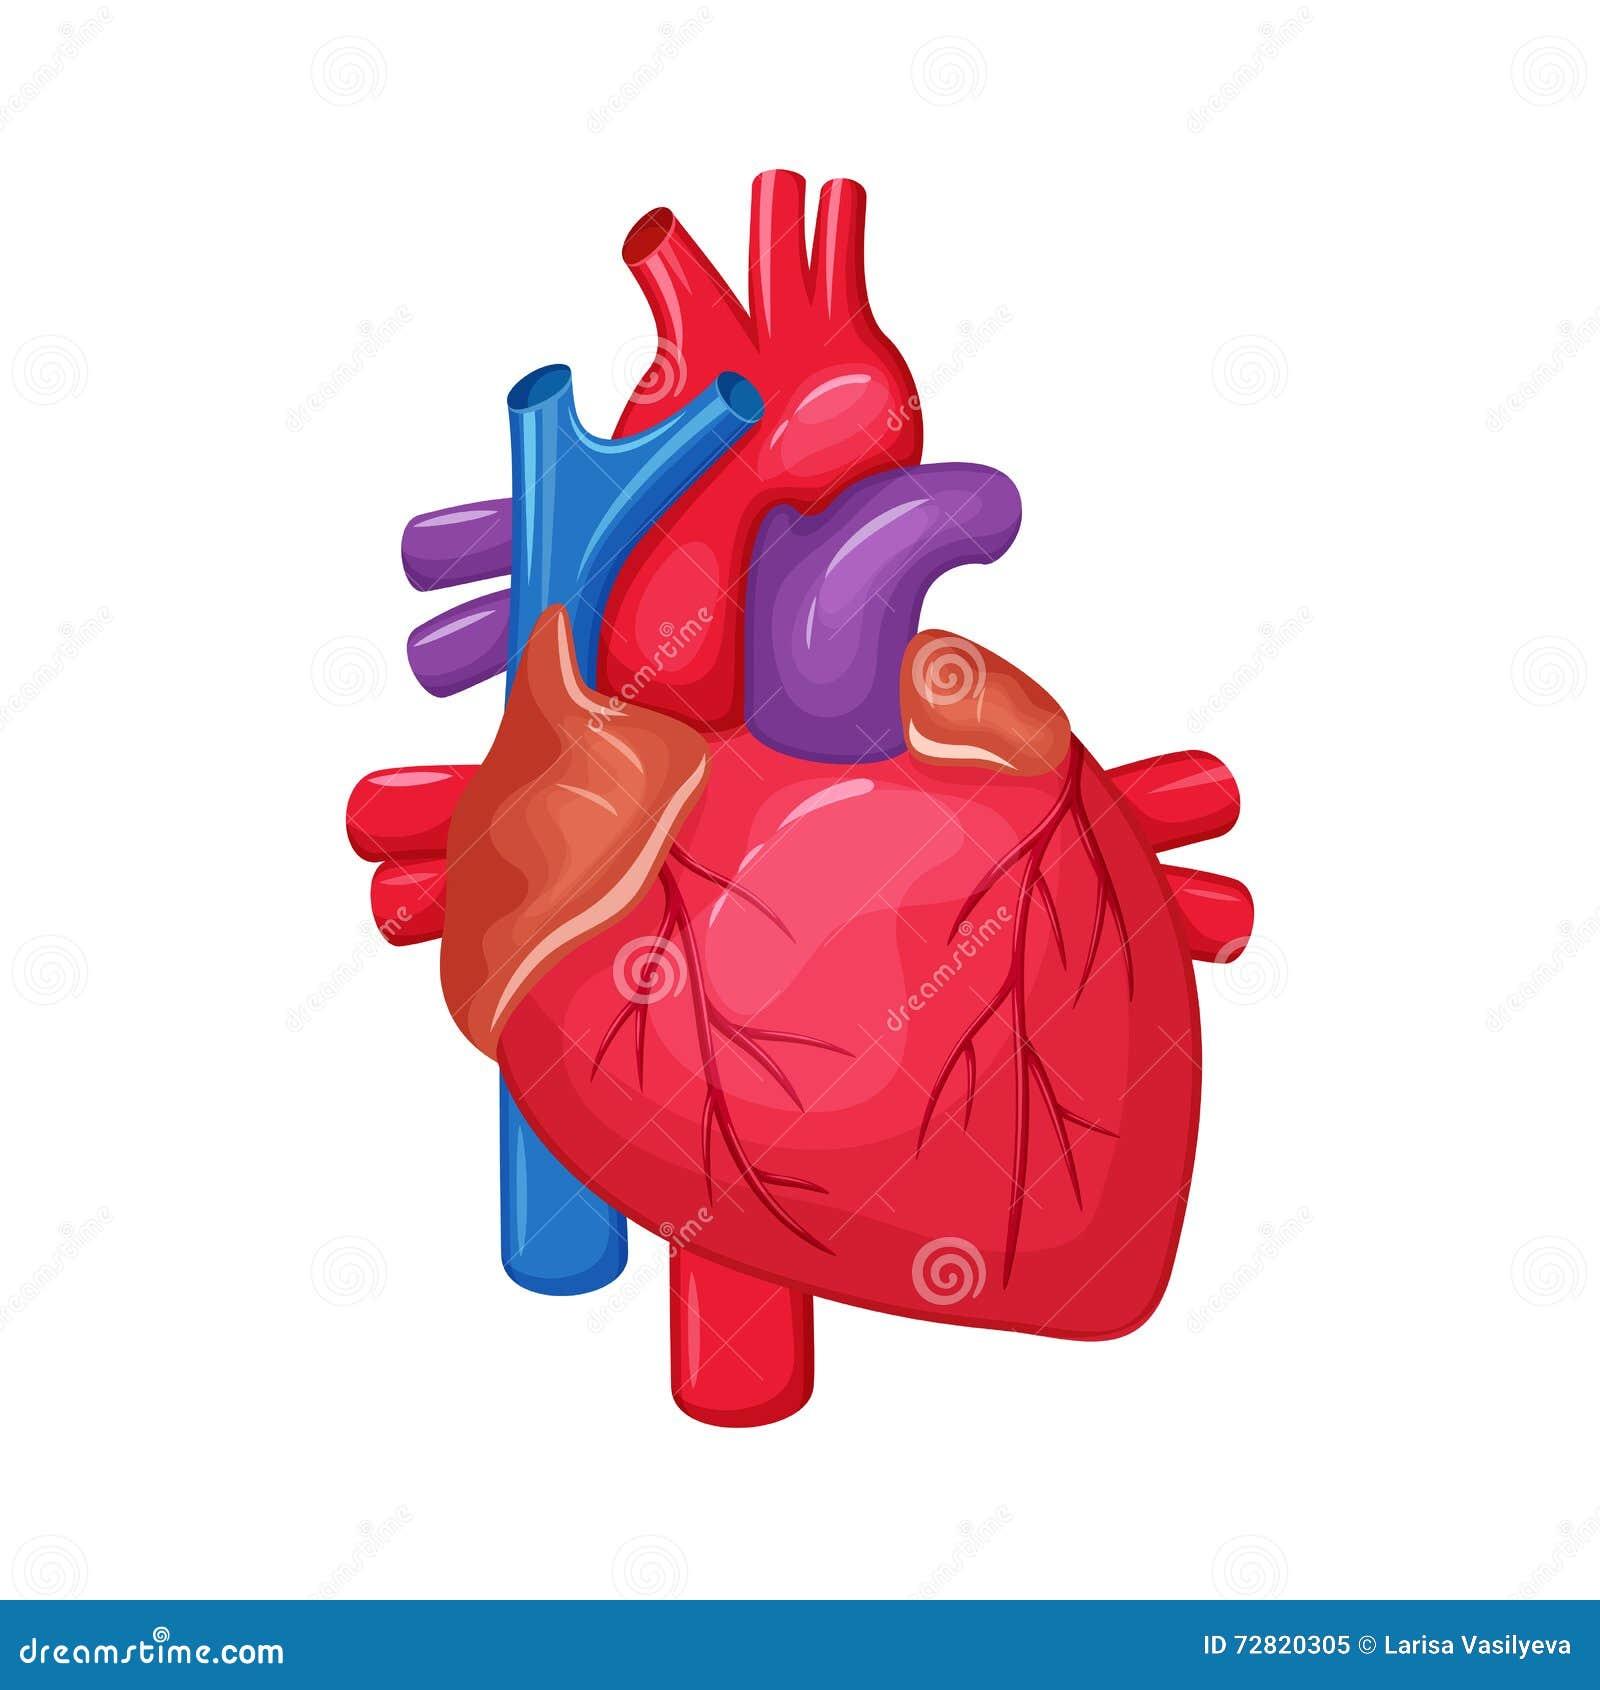 Human Heart Anatomy Stock Vector Illustration Of Circulation 72820305